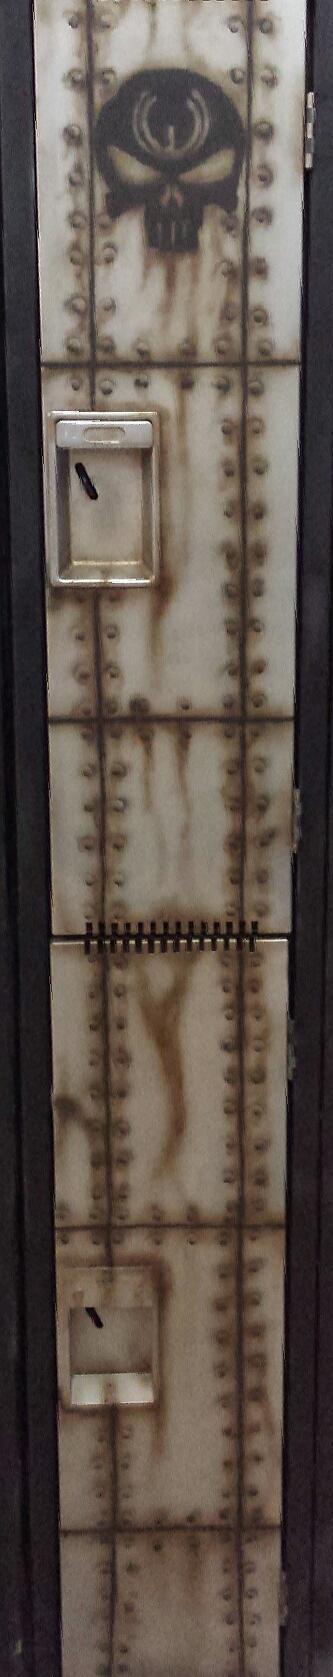 Ironsight Kustoms steel rusted locker by moose-lee